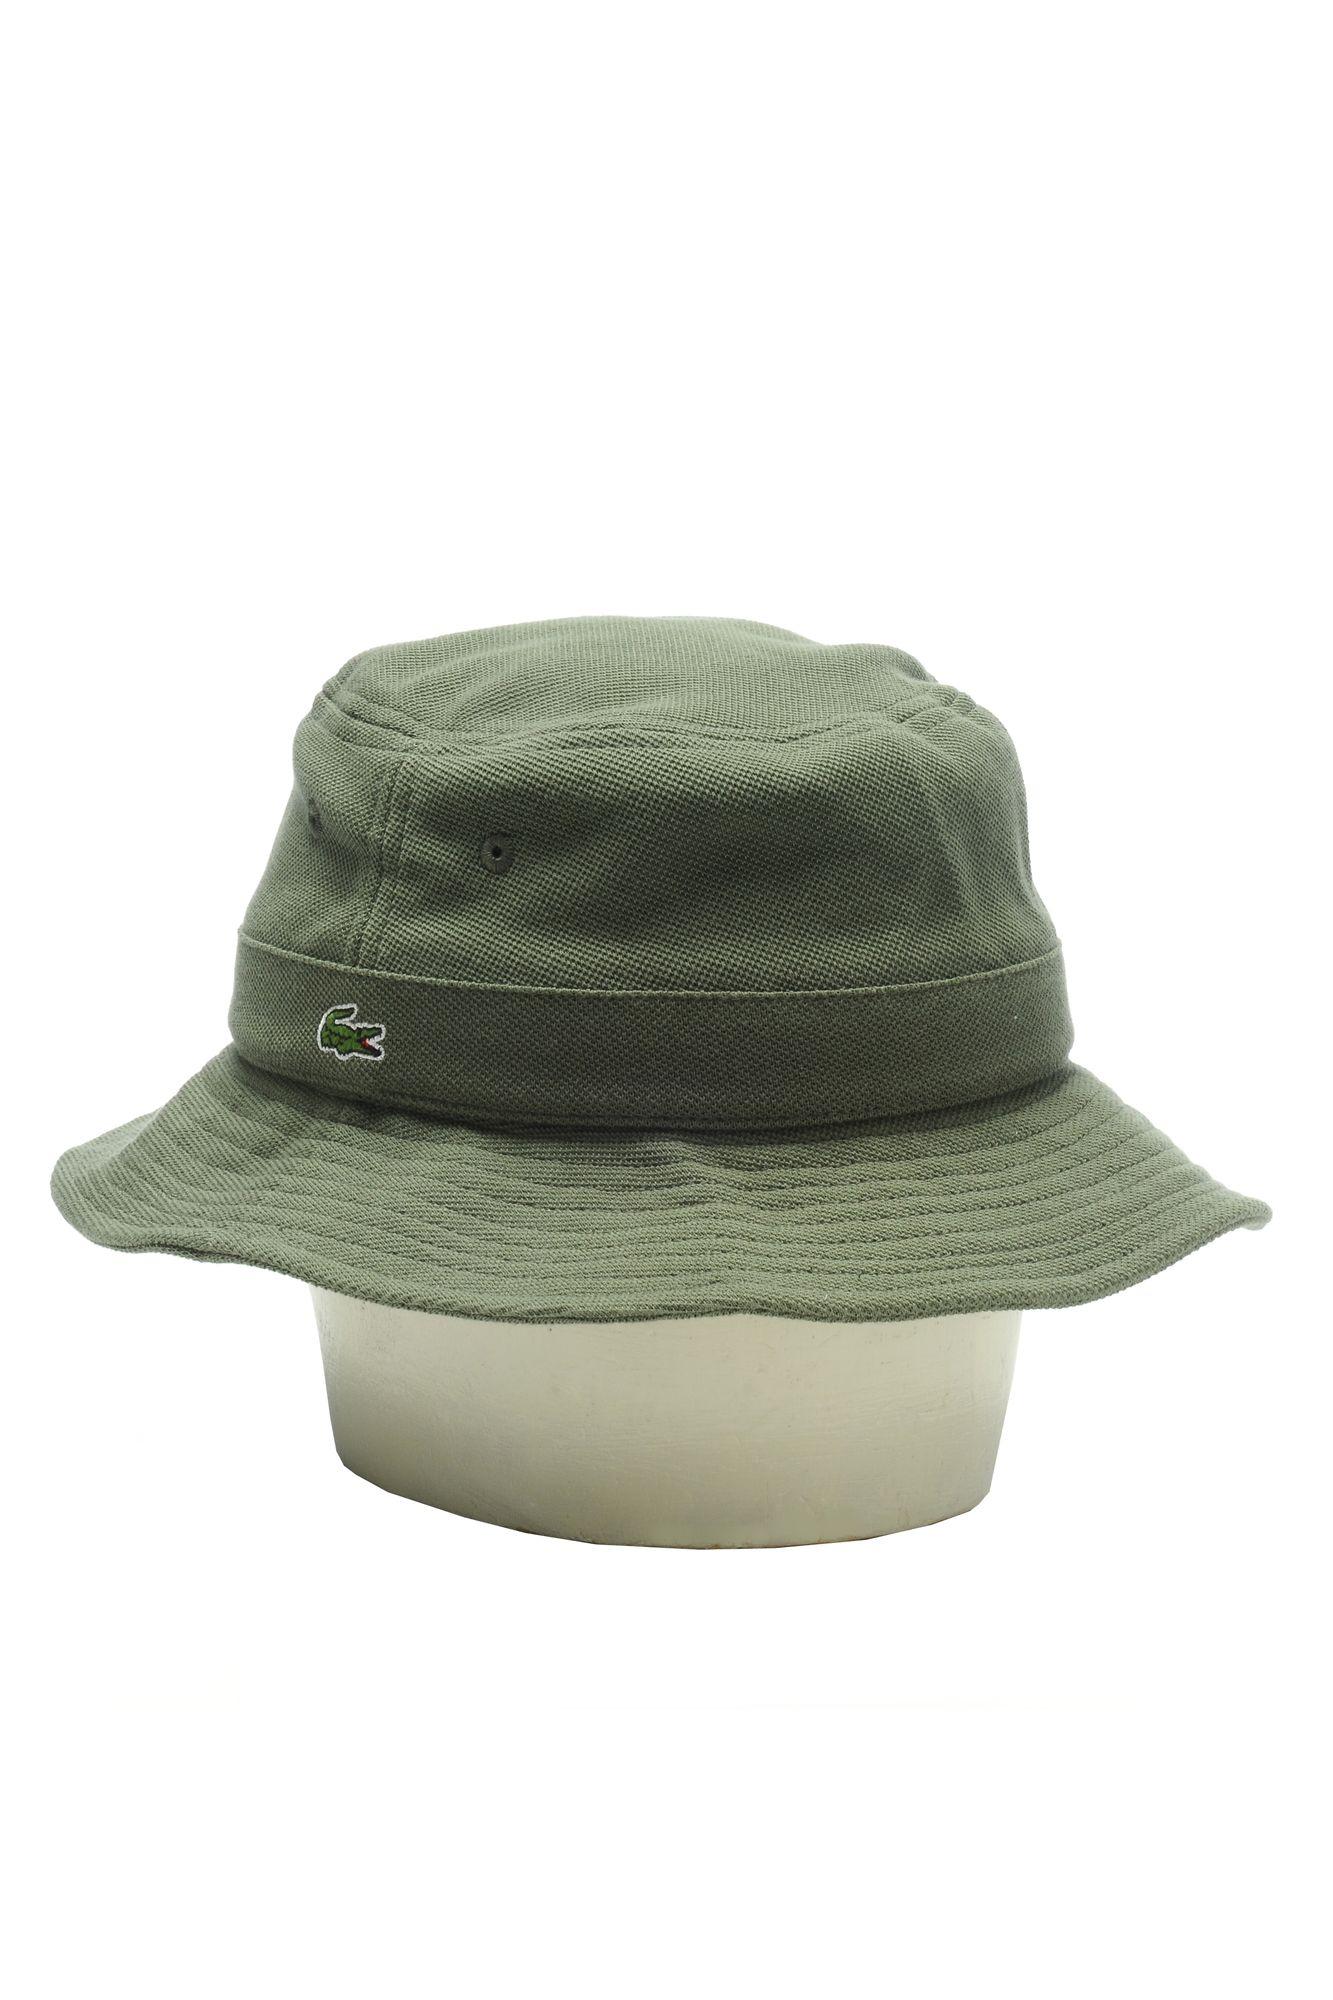 875e9441 Lacoste Men's Pique Bucket Cap : Caps & Hats | Cool stuff 78 | Hats ...